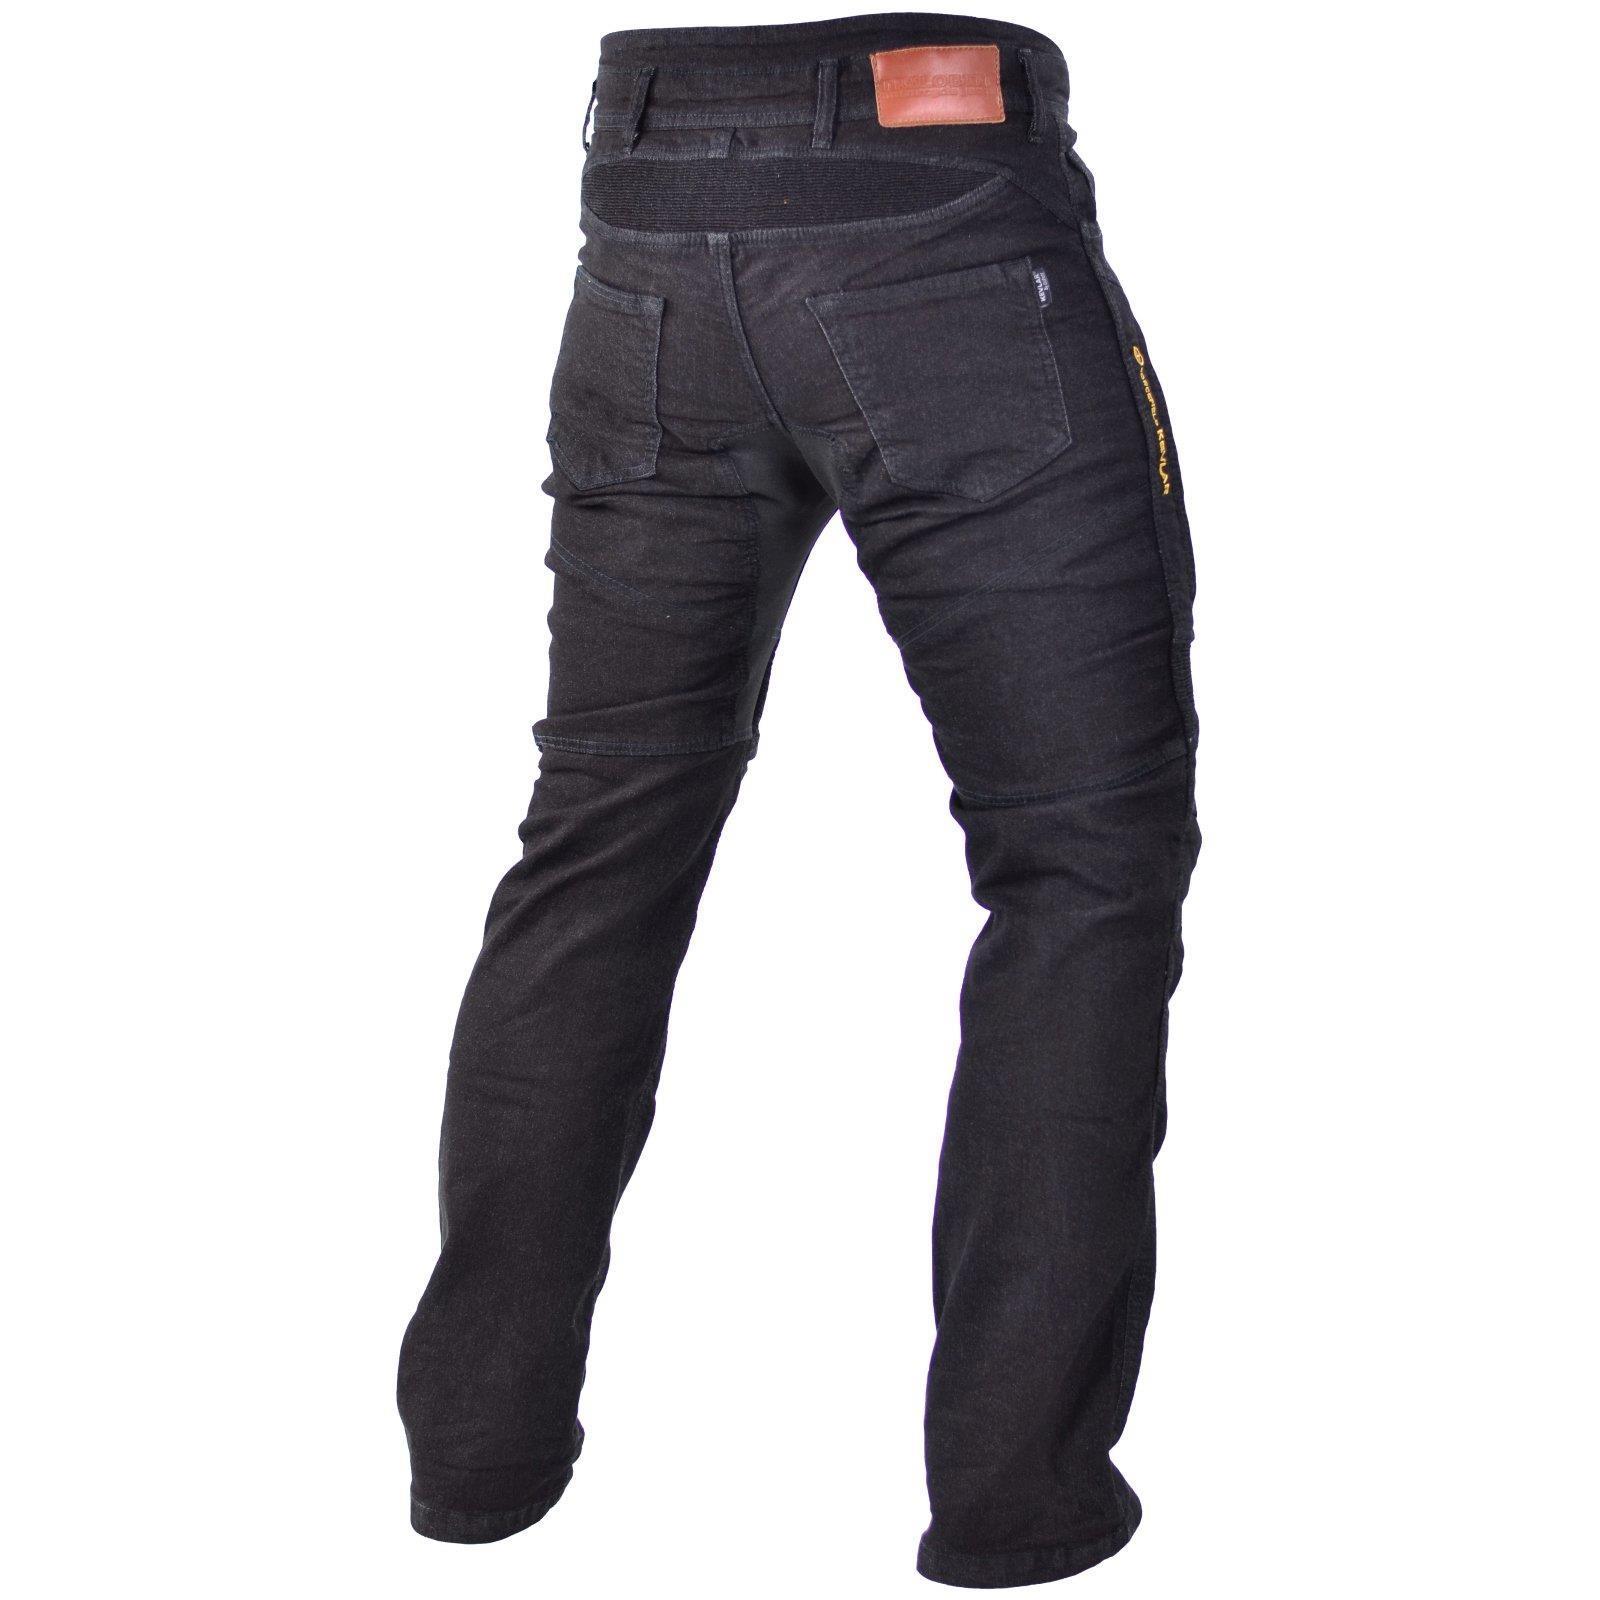 Trilobite-Pantaloni-Moto-Jeans-Abbigliamento-Parado-MICAS-URBAN-DUAL-PANTS-ACID miniatura 49